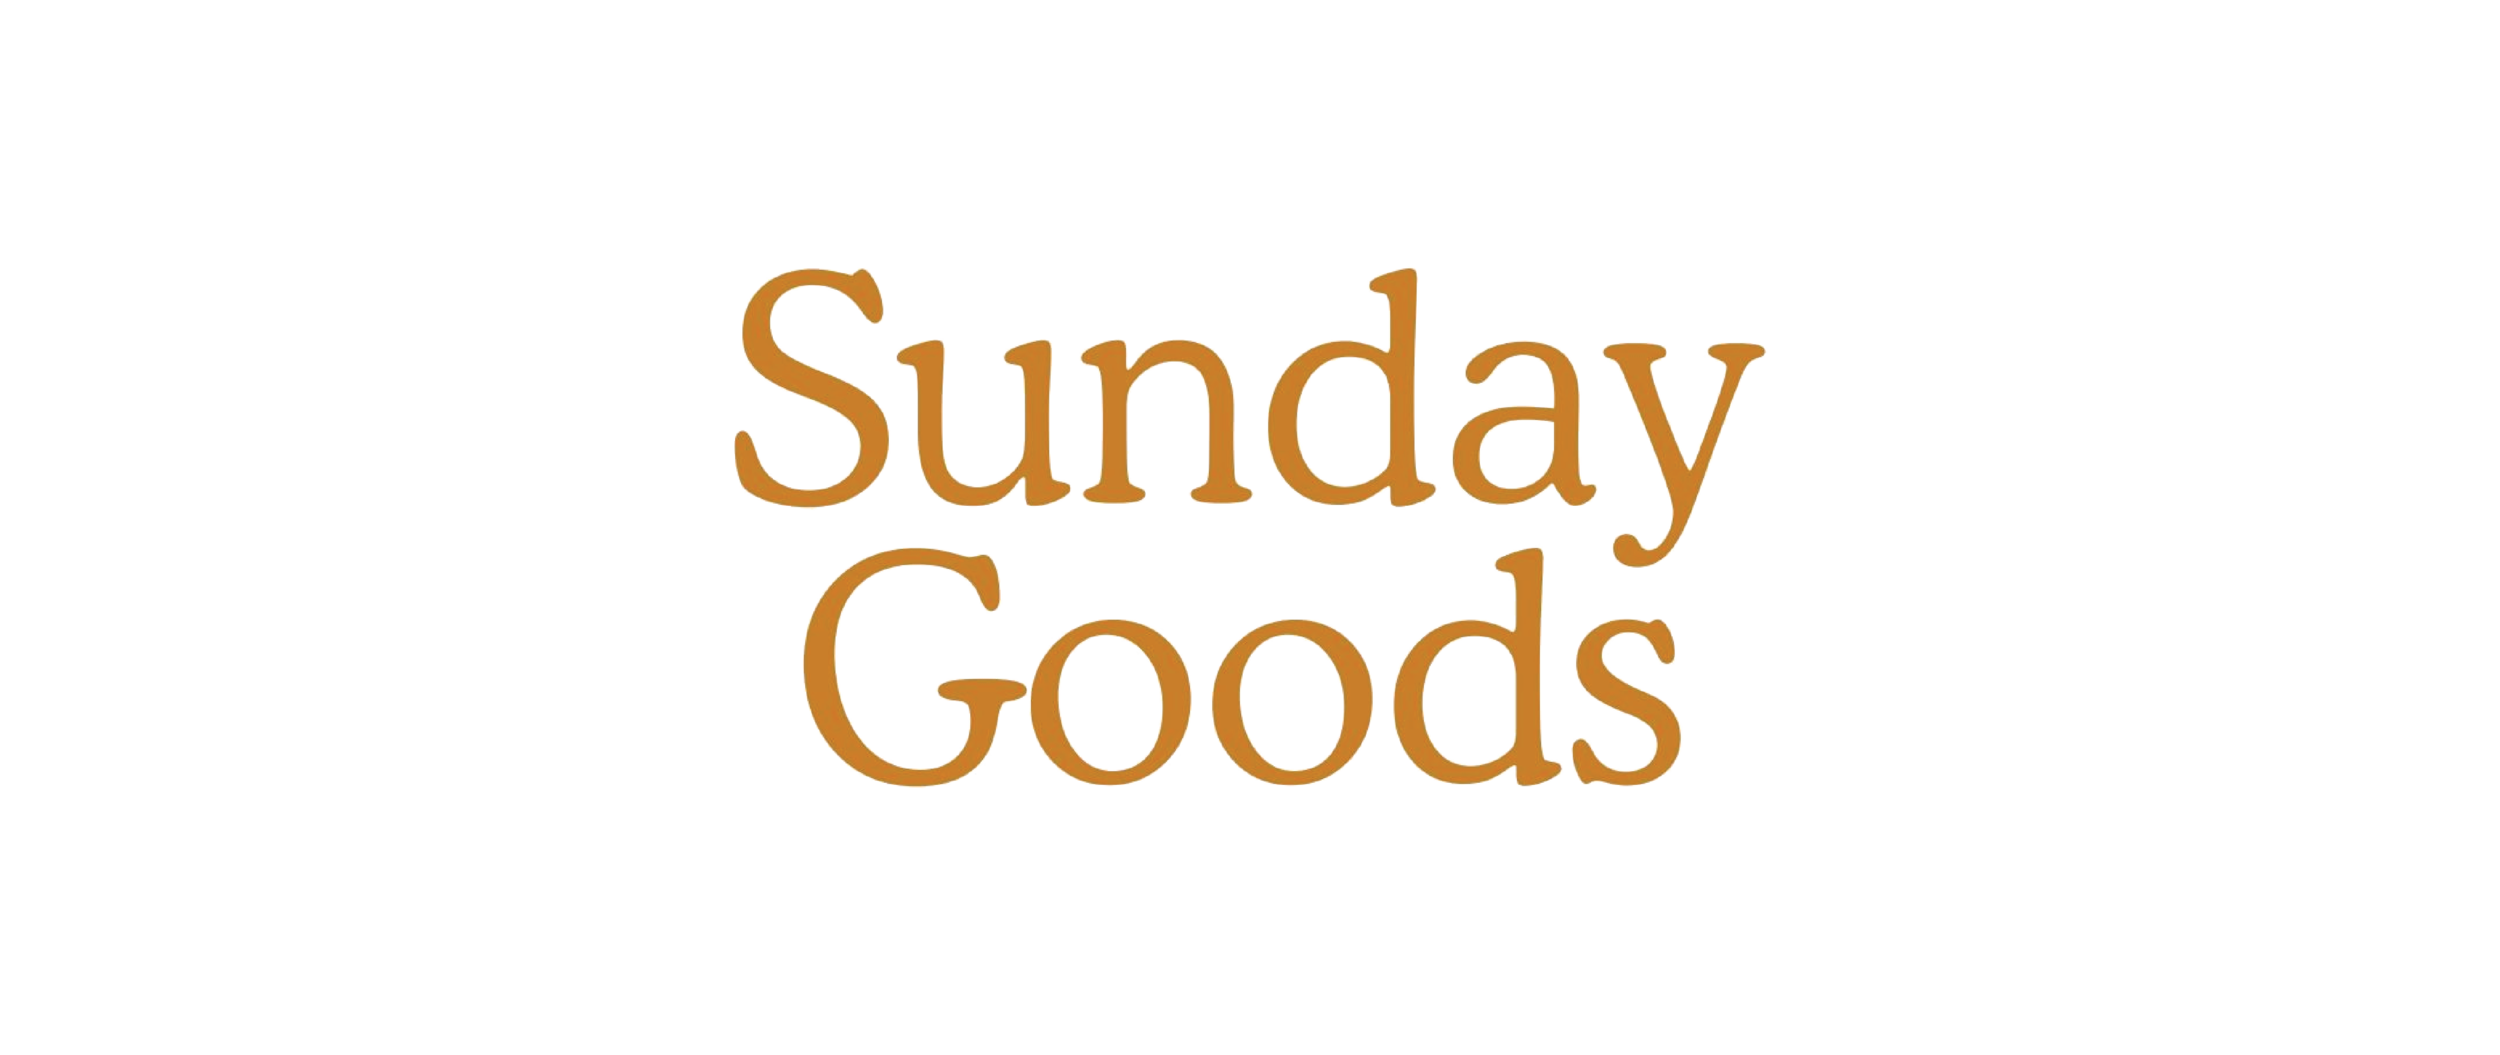 sundaygoods-03.png